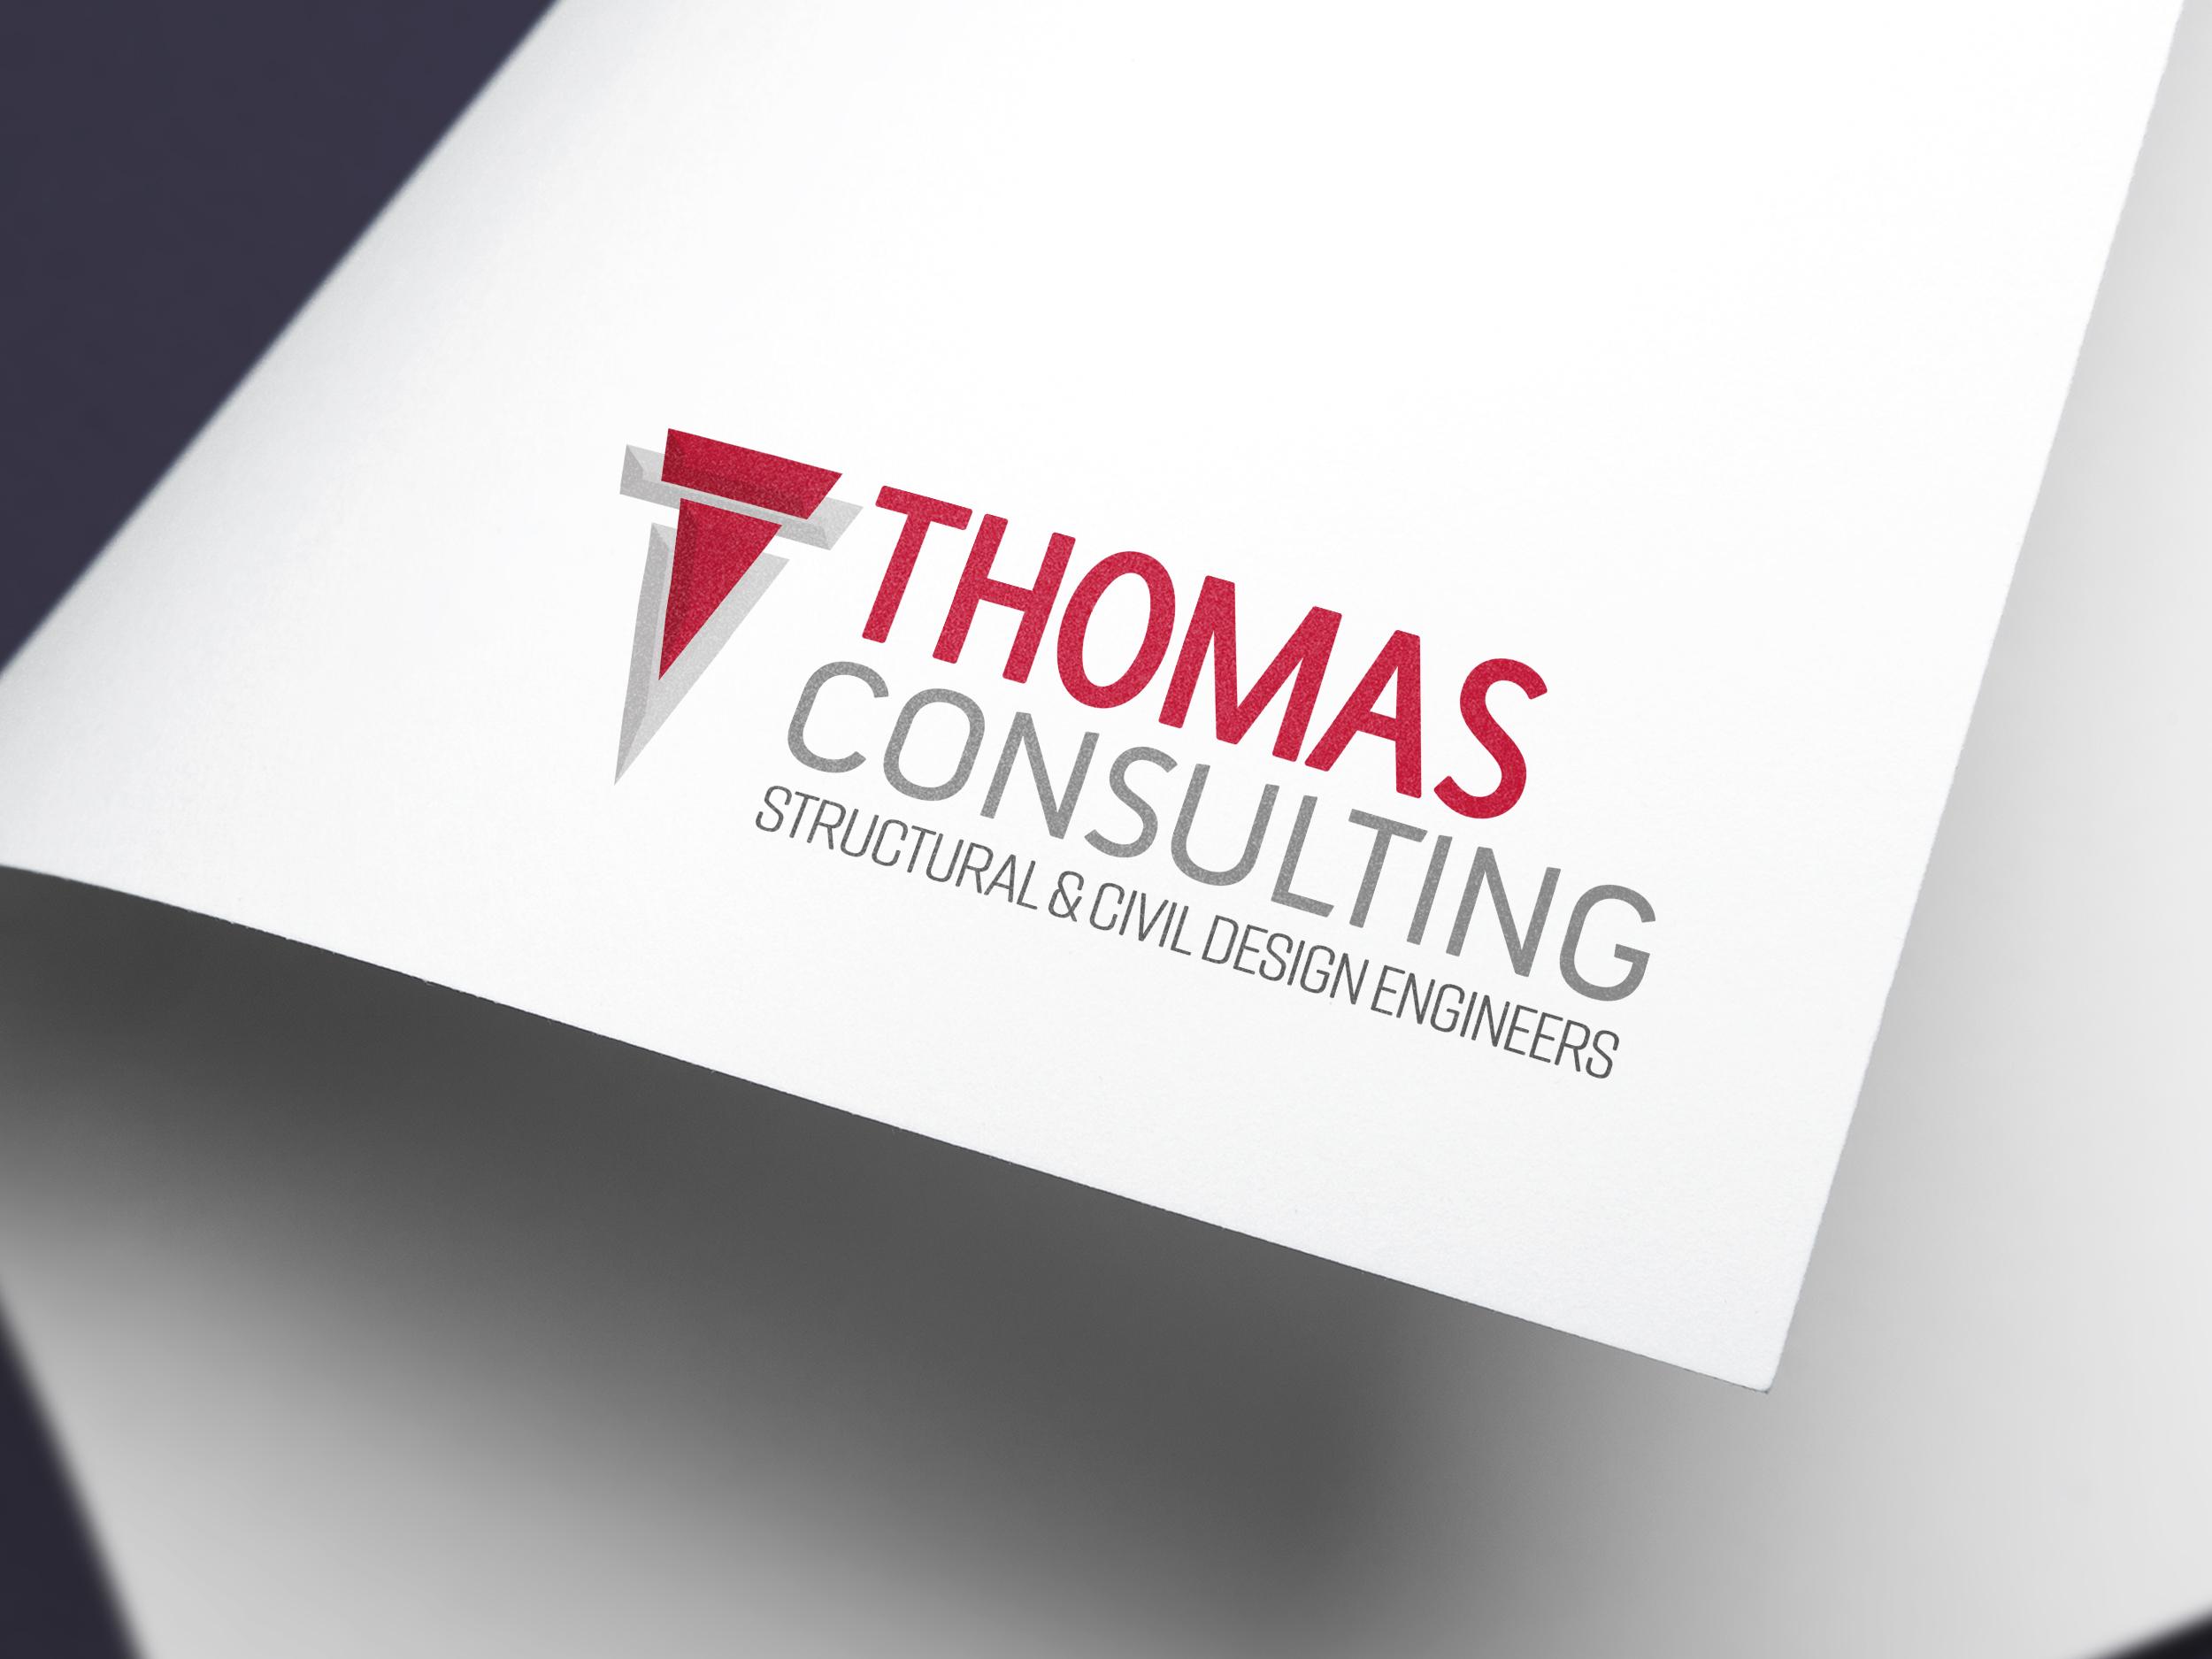 Thomas Consulting